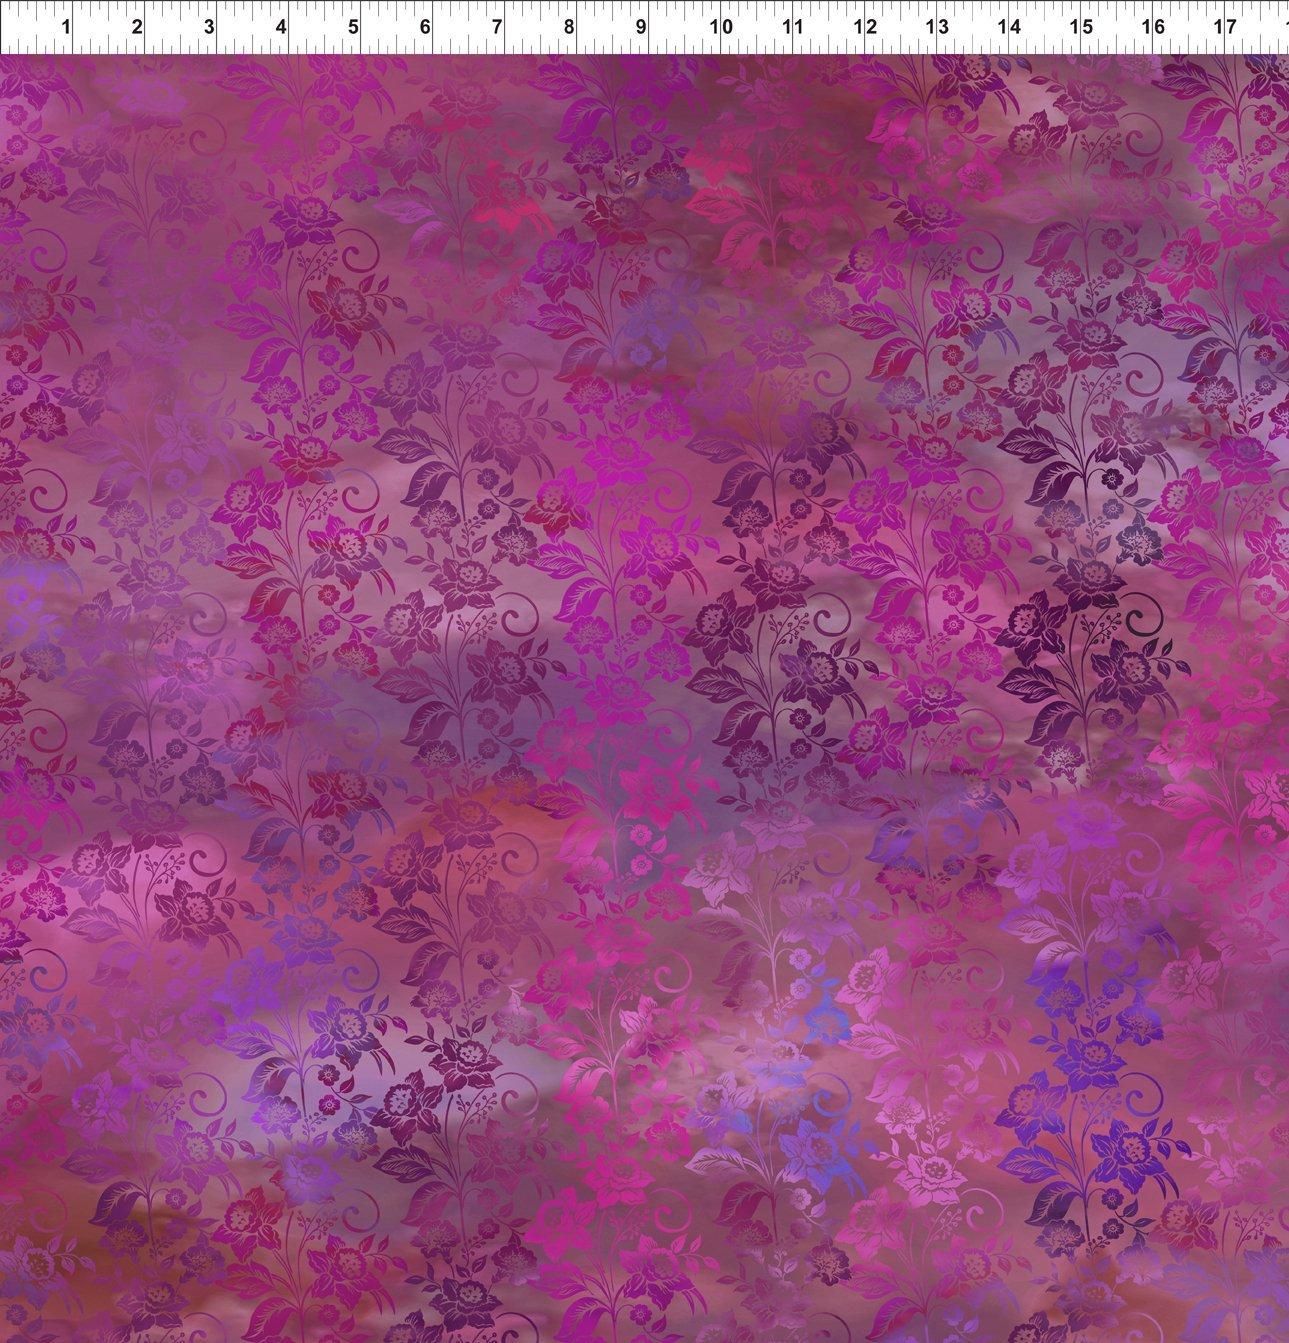 5ENC-4 Magenta Enchanted Vines Diaphanous